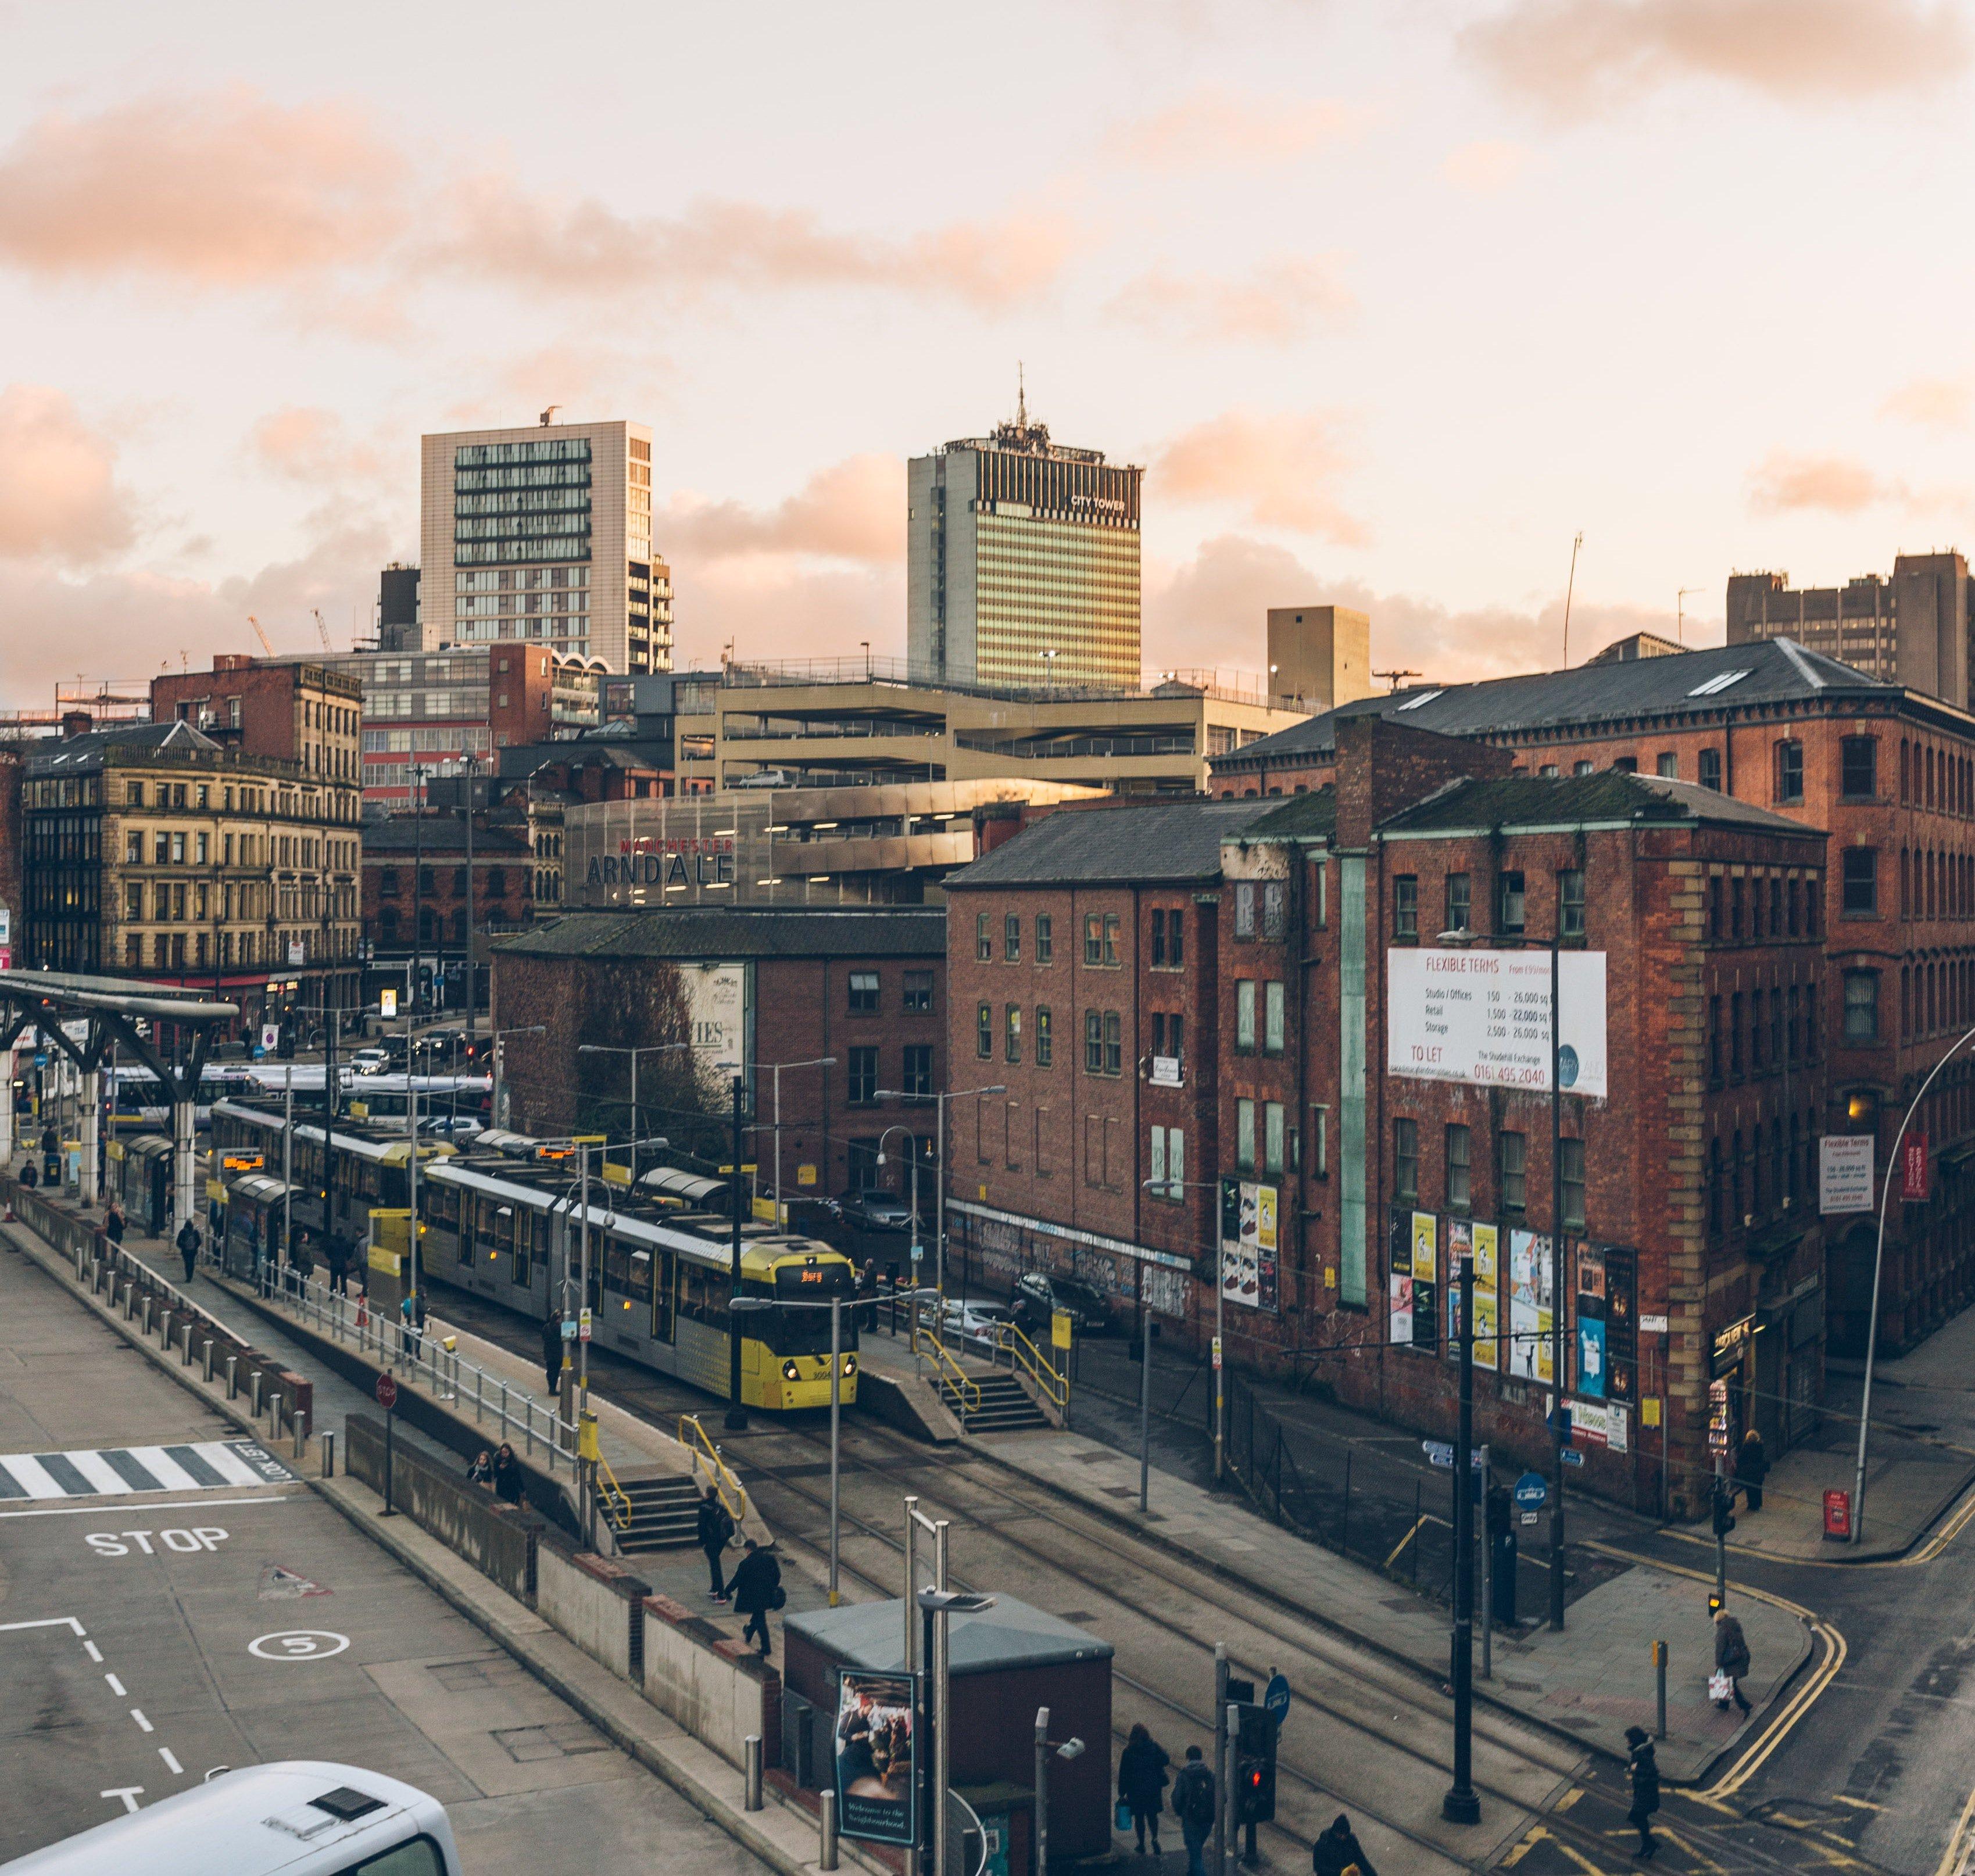 Manchester fraser-cottrell-1389545-unsplash.jpg